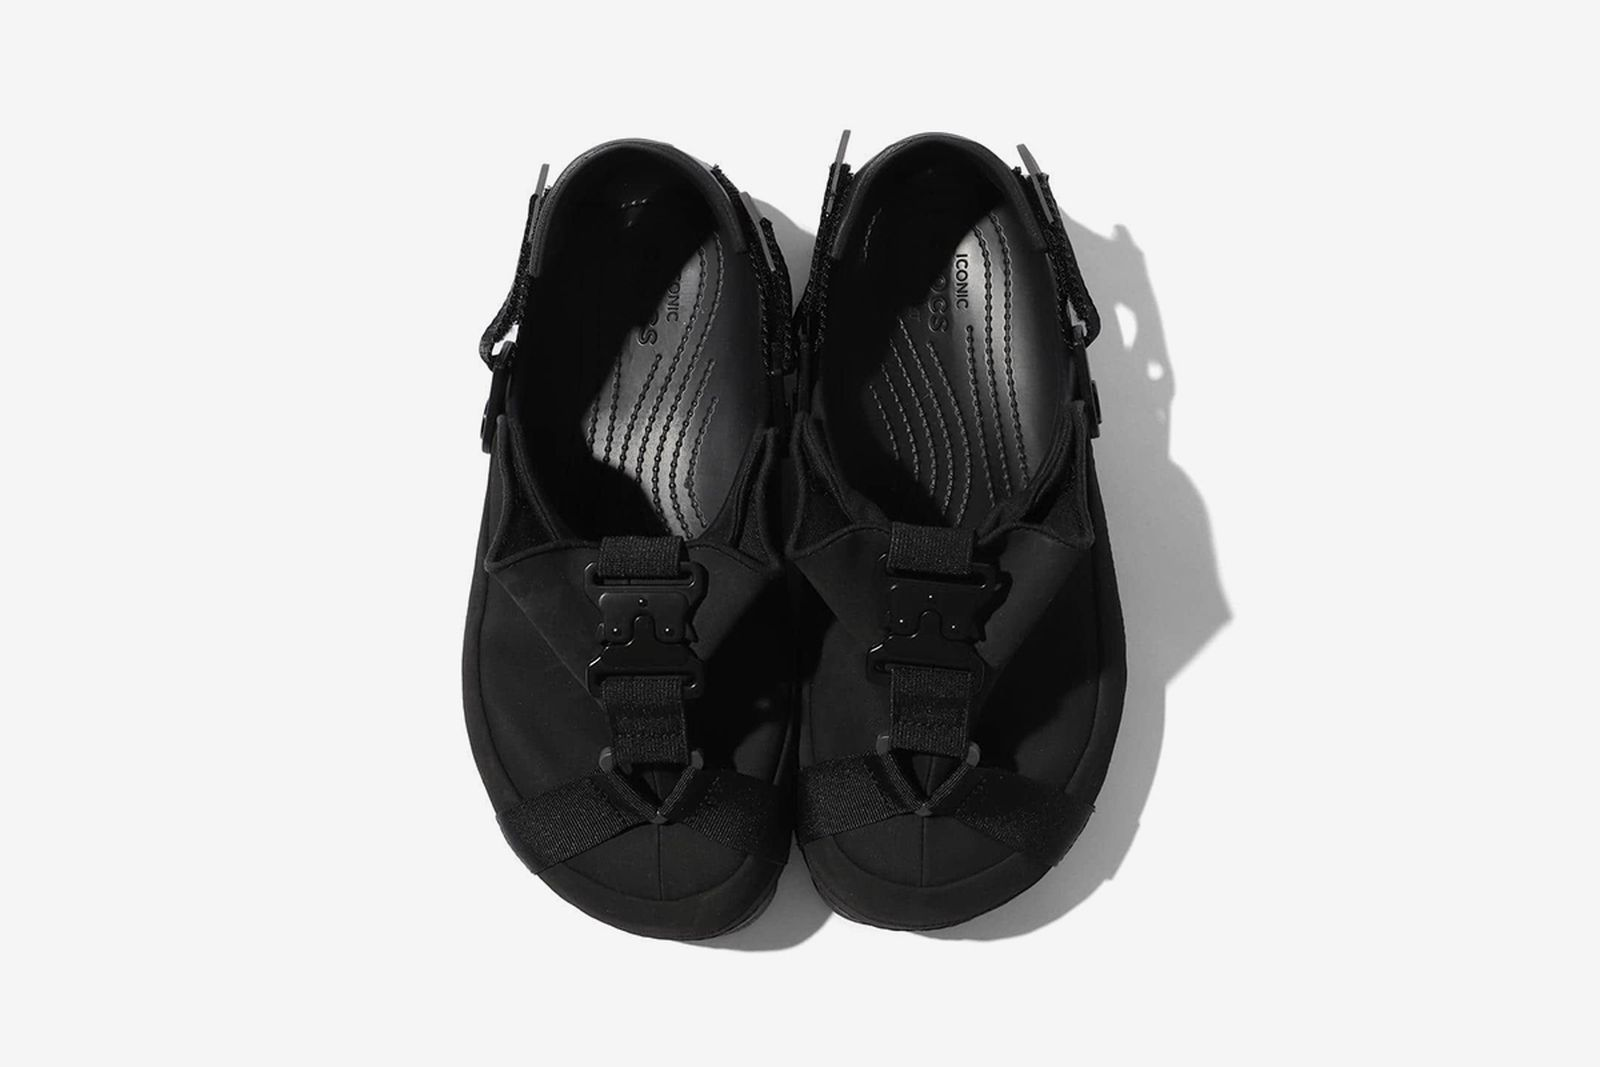 beams-crocs-spring-2020-release-date-price-1-05